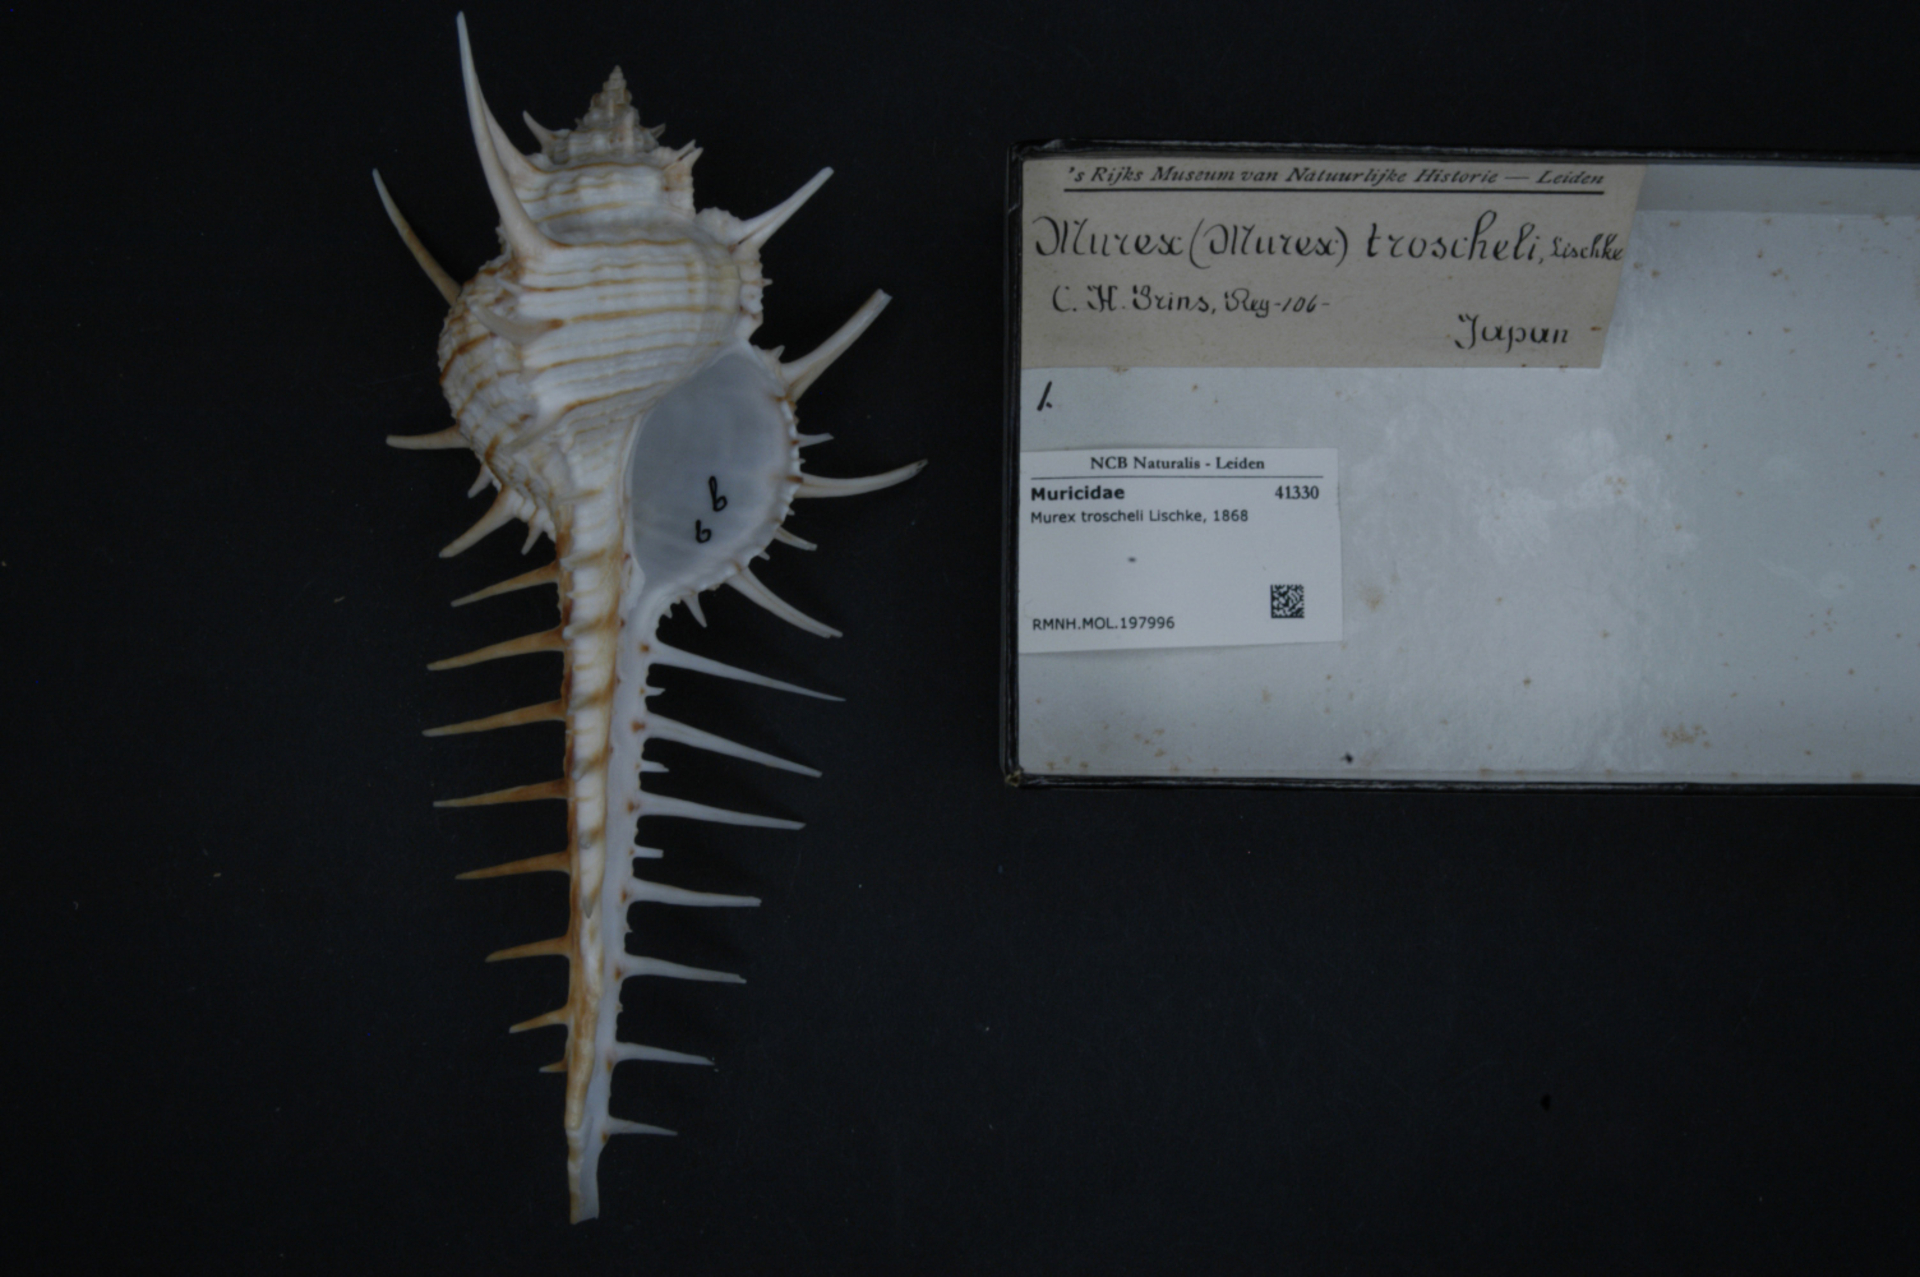 RMNH.MOL.197996 | Murex troscheli Lischke, 1868